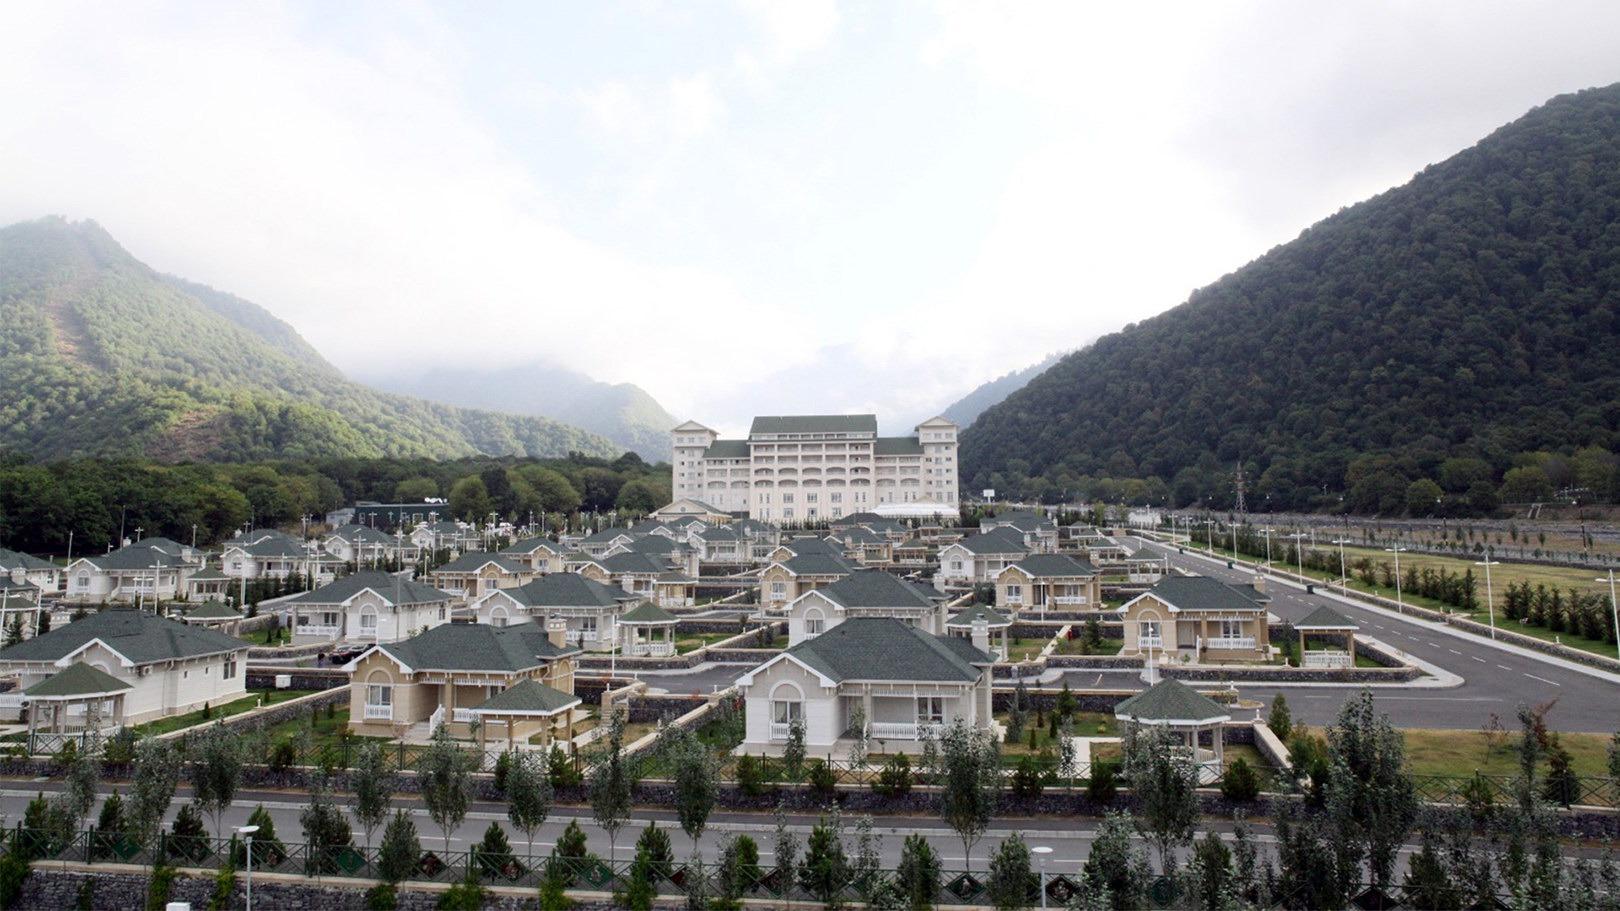 kafkas riverside resort hotel